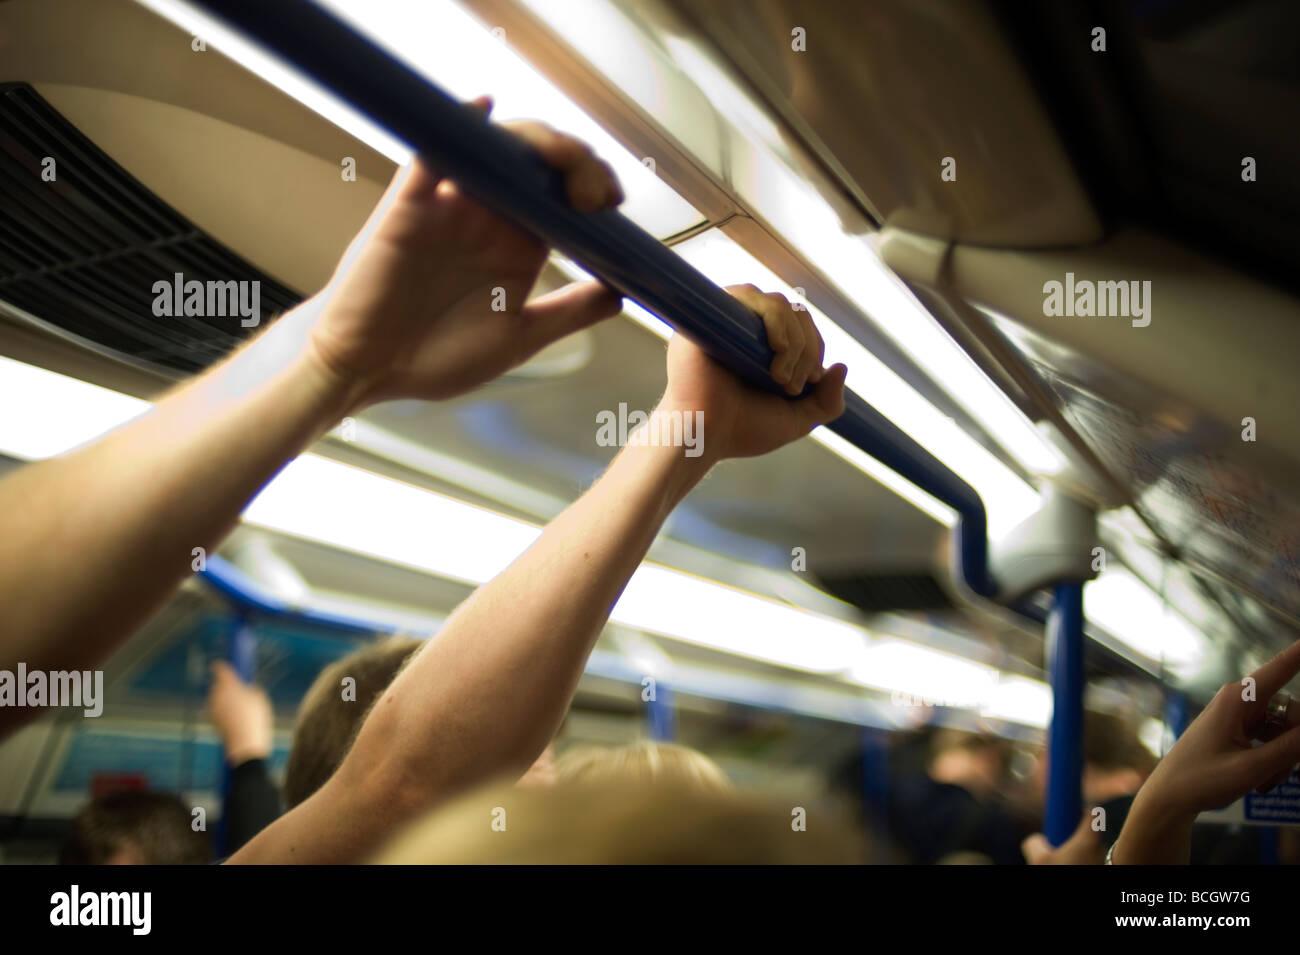 London Underground tube comute surpeuplés écraser la ligne Piccadilly voyage straphanging sueur chaude Photo Stock